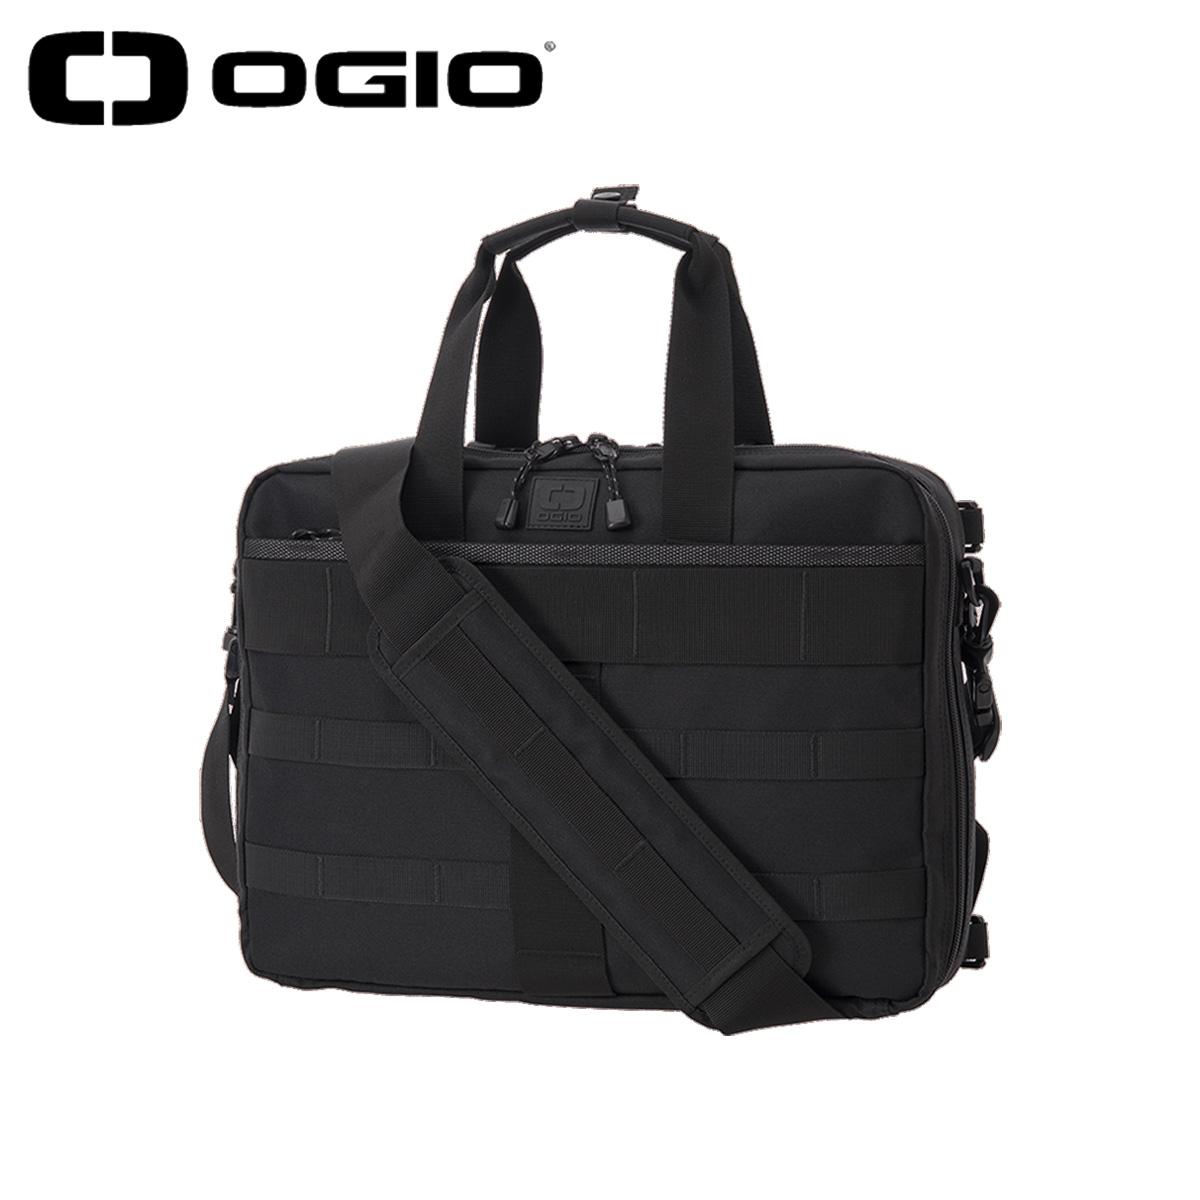 OGIO オジオ バッグ ビジネスバッグ ブリーフケース メンズ 11L CORE CONVOY 3WAY BRIEF CASE SMALL BAG 20 JM ブラック 黒 5920160OG